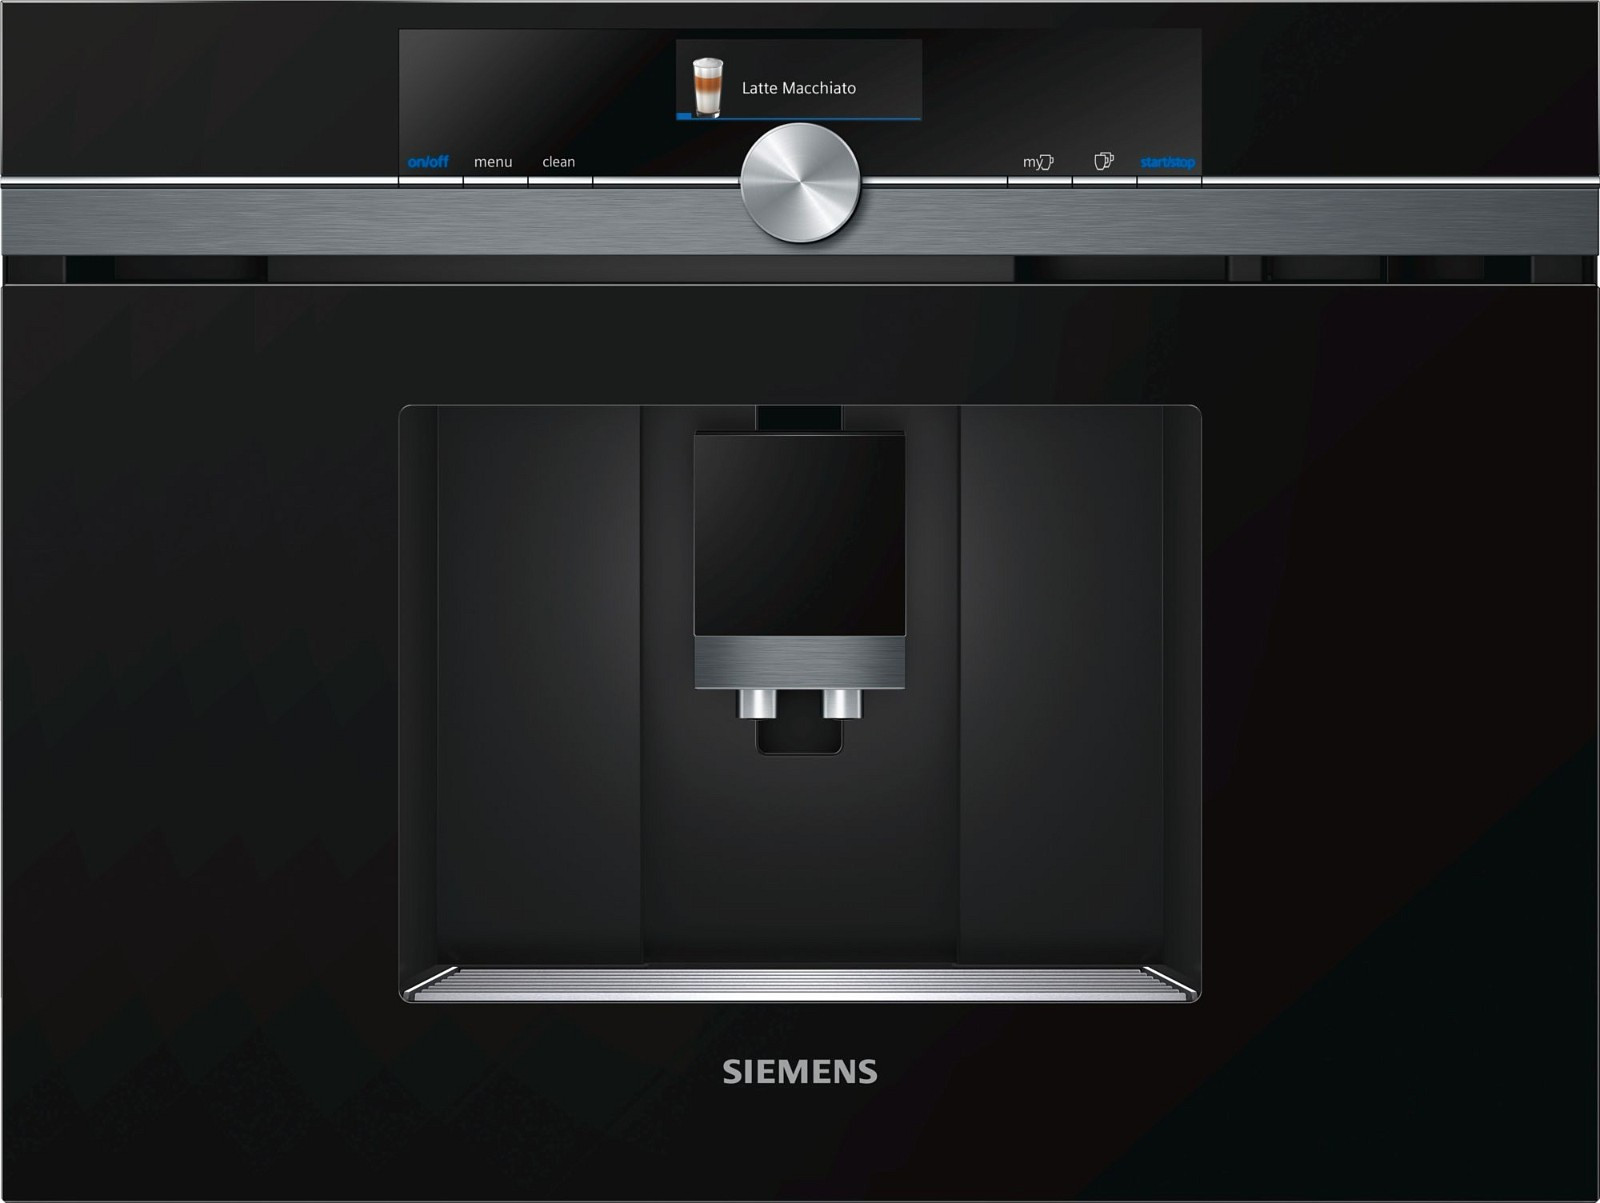 siemens espresso kaffemaskin black steel ct836leb6 39 veil. Black Bedroom Furniture Sets. Home Design Ideas